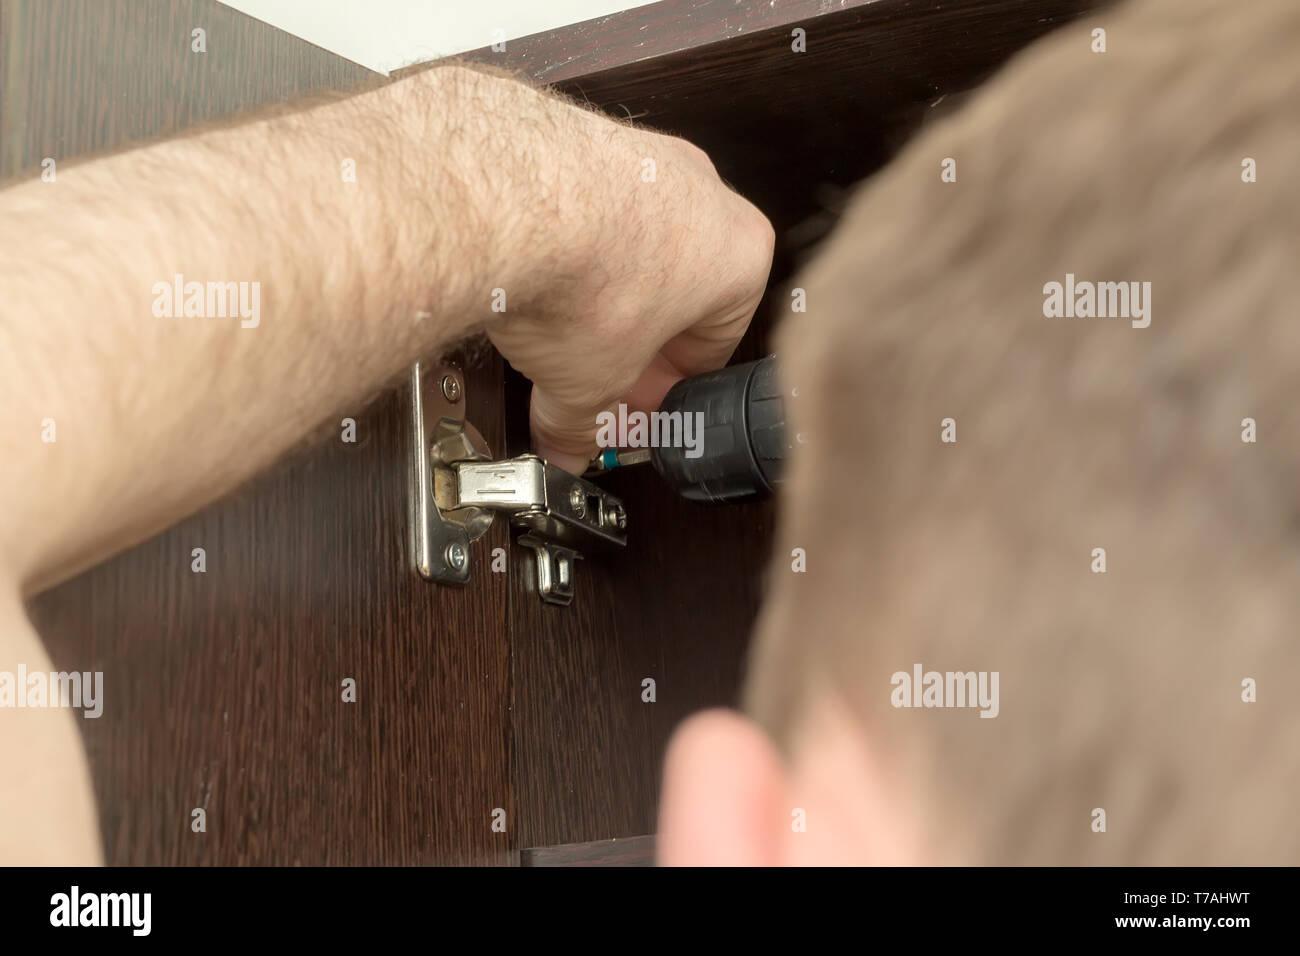 Fixing door furniture hinges. Fixing furniture hinges - Stock Image